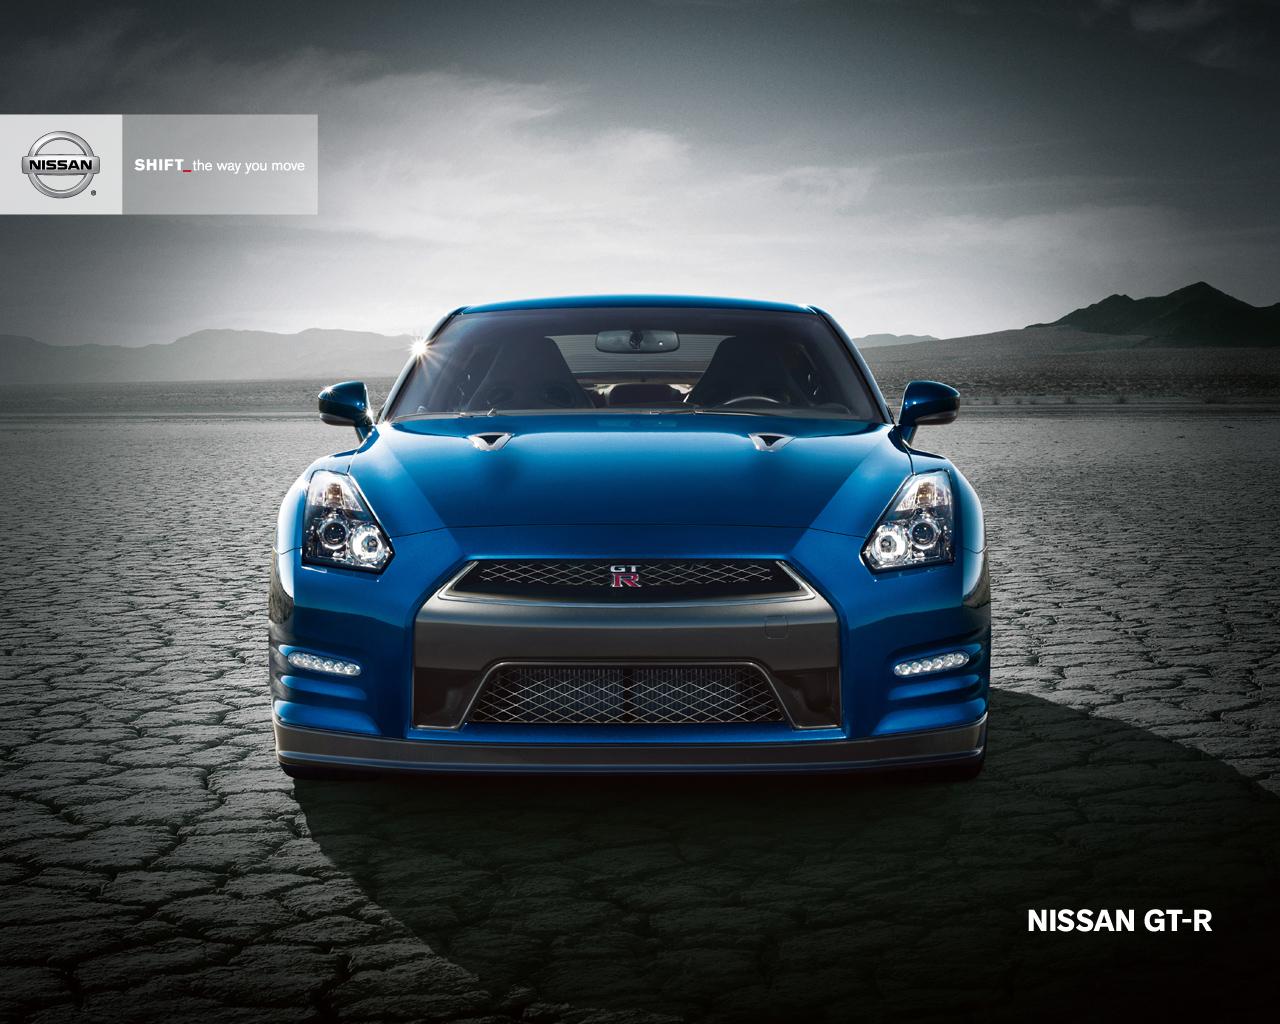 http://4.bp.blogspot.com/-C3XZgzMyvGE/UEBuSIFFAXI/AAAAAAAAC4w/LFJu3kelMfk/s1600/Nissan+GTR+Sports+Super+Car++Exterior+Blue+front++view+653.jpg